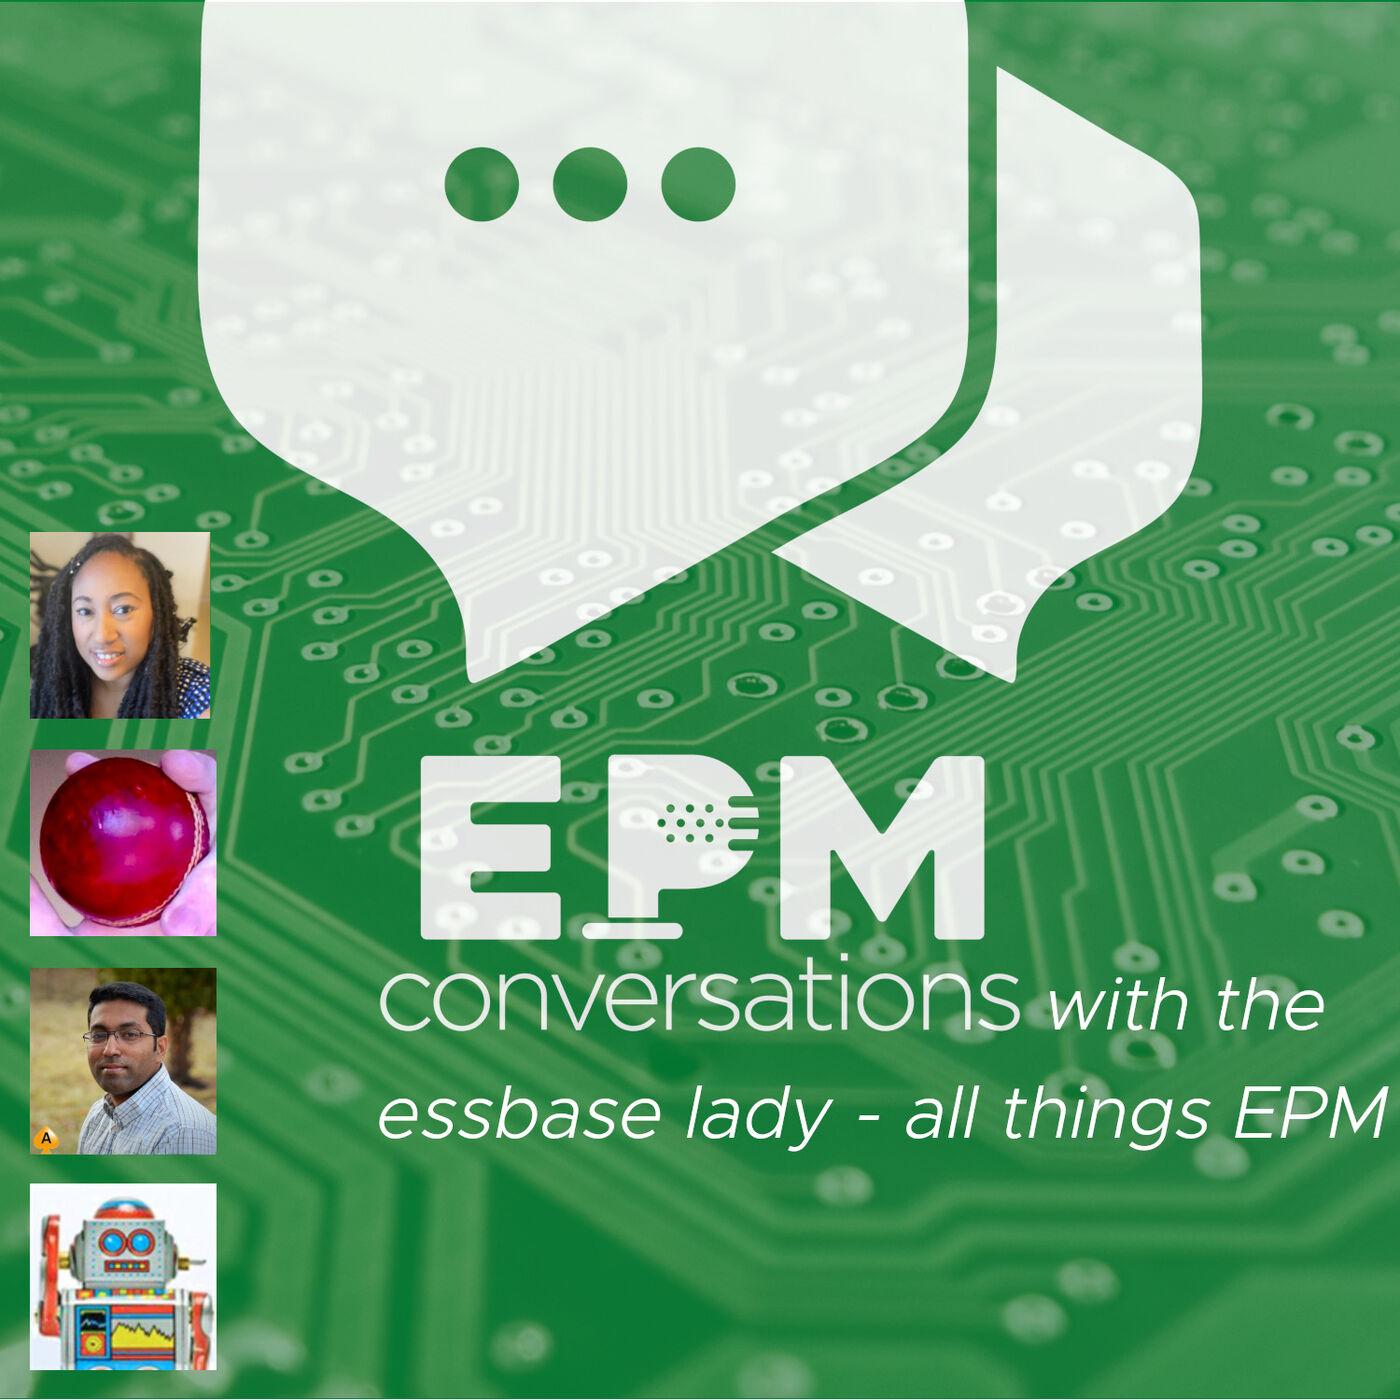 EPM Conversations — Episode No. 2 Part 2, a conversation with Essbase Lady, Natalie Delemar